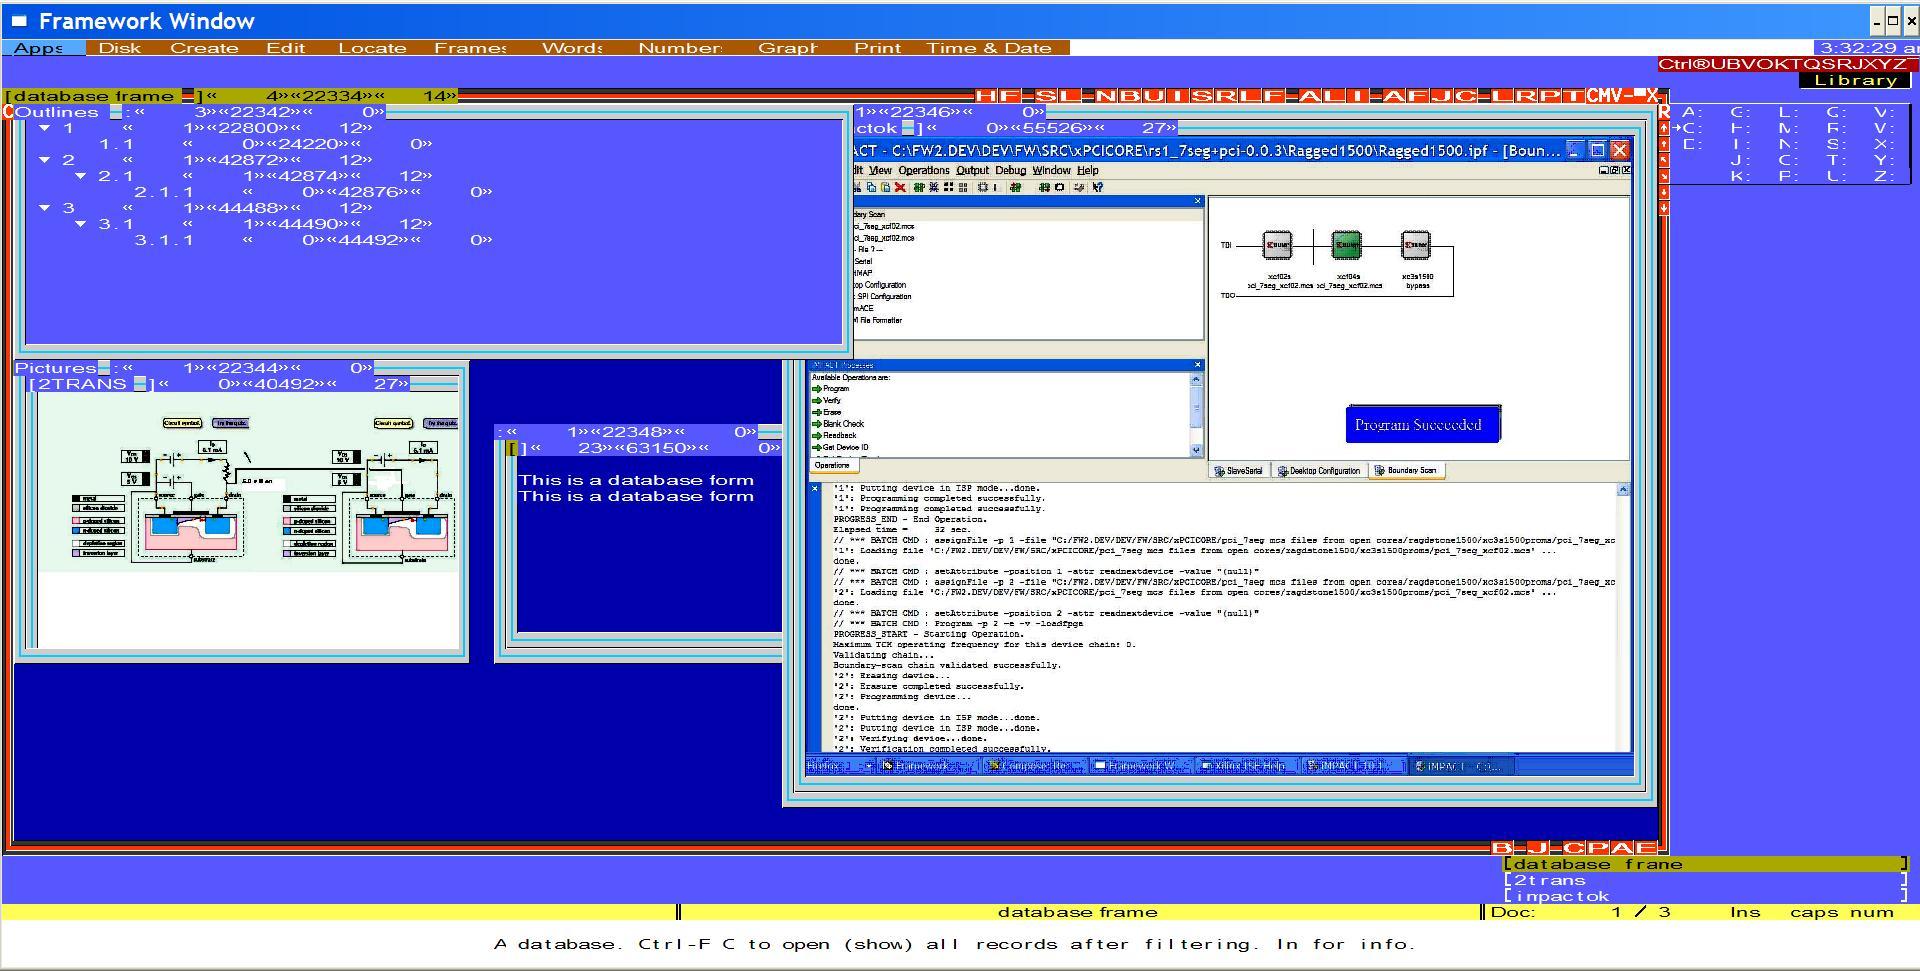 Framework 4 download windows xp